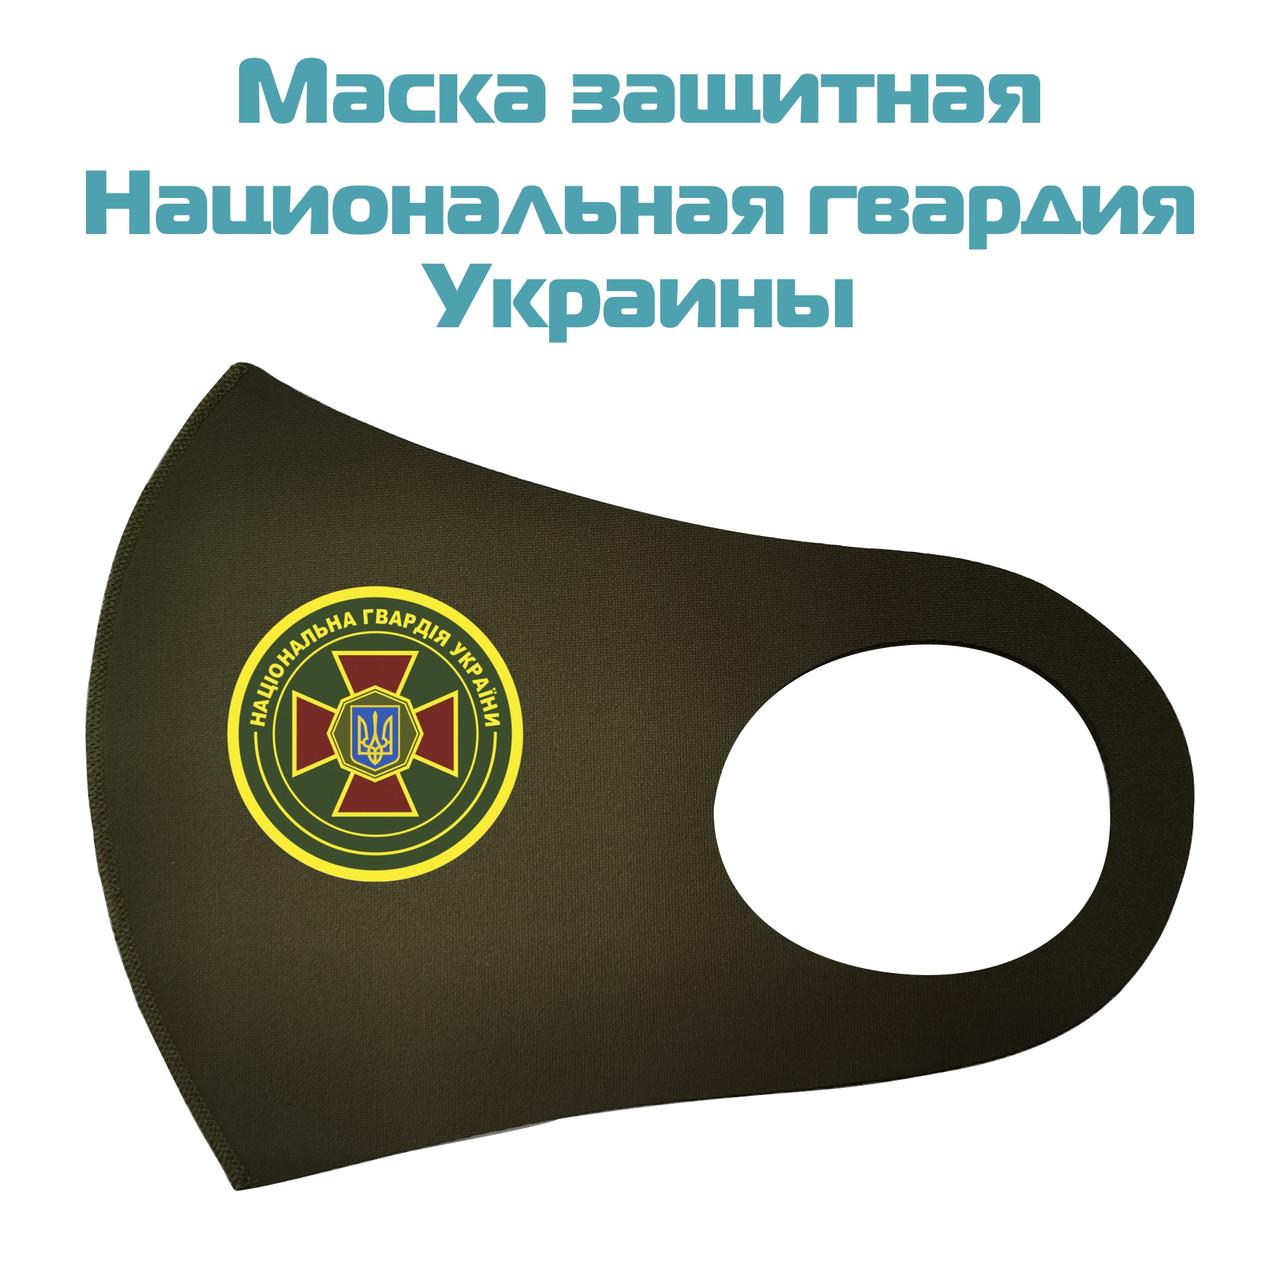 "Маска защитная для лица ""Национальная гвардия Украины"""